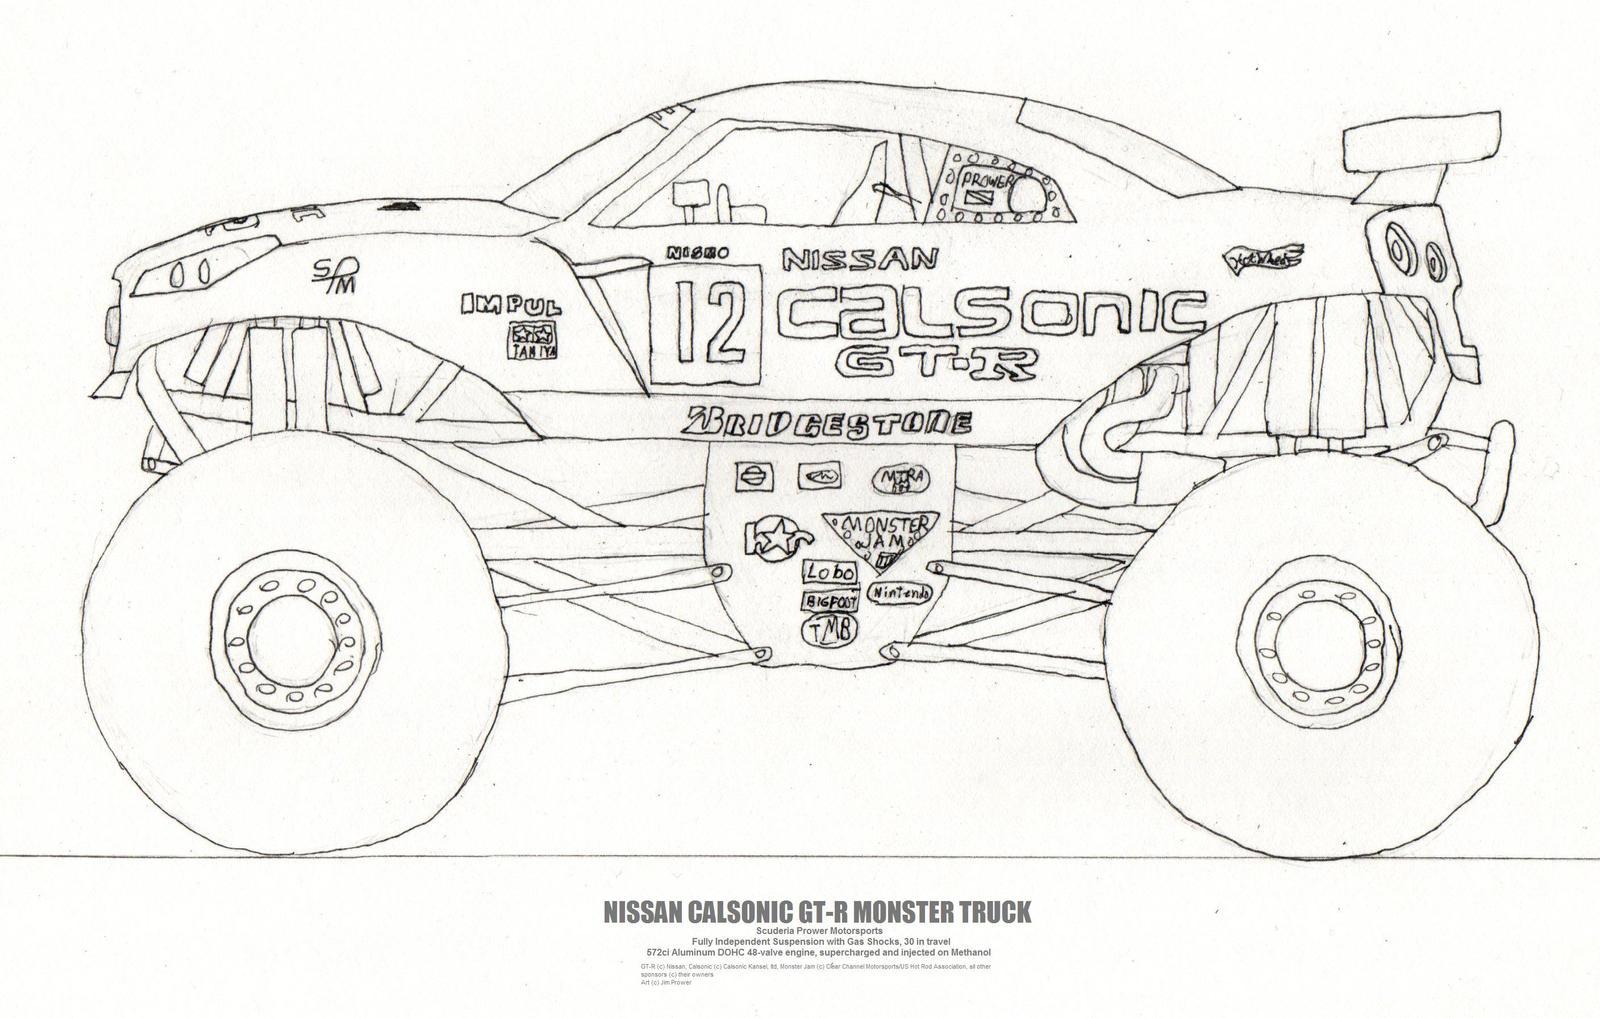 Uncategorized How To Draw Monster Trucks the nissan gt r monster truck by jim prower on deviantart prower